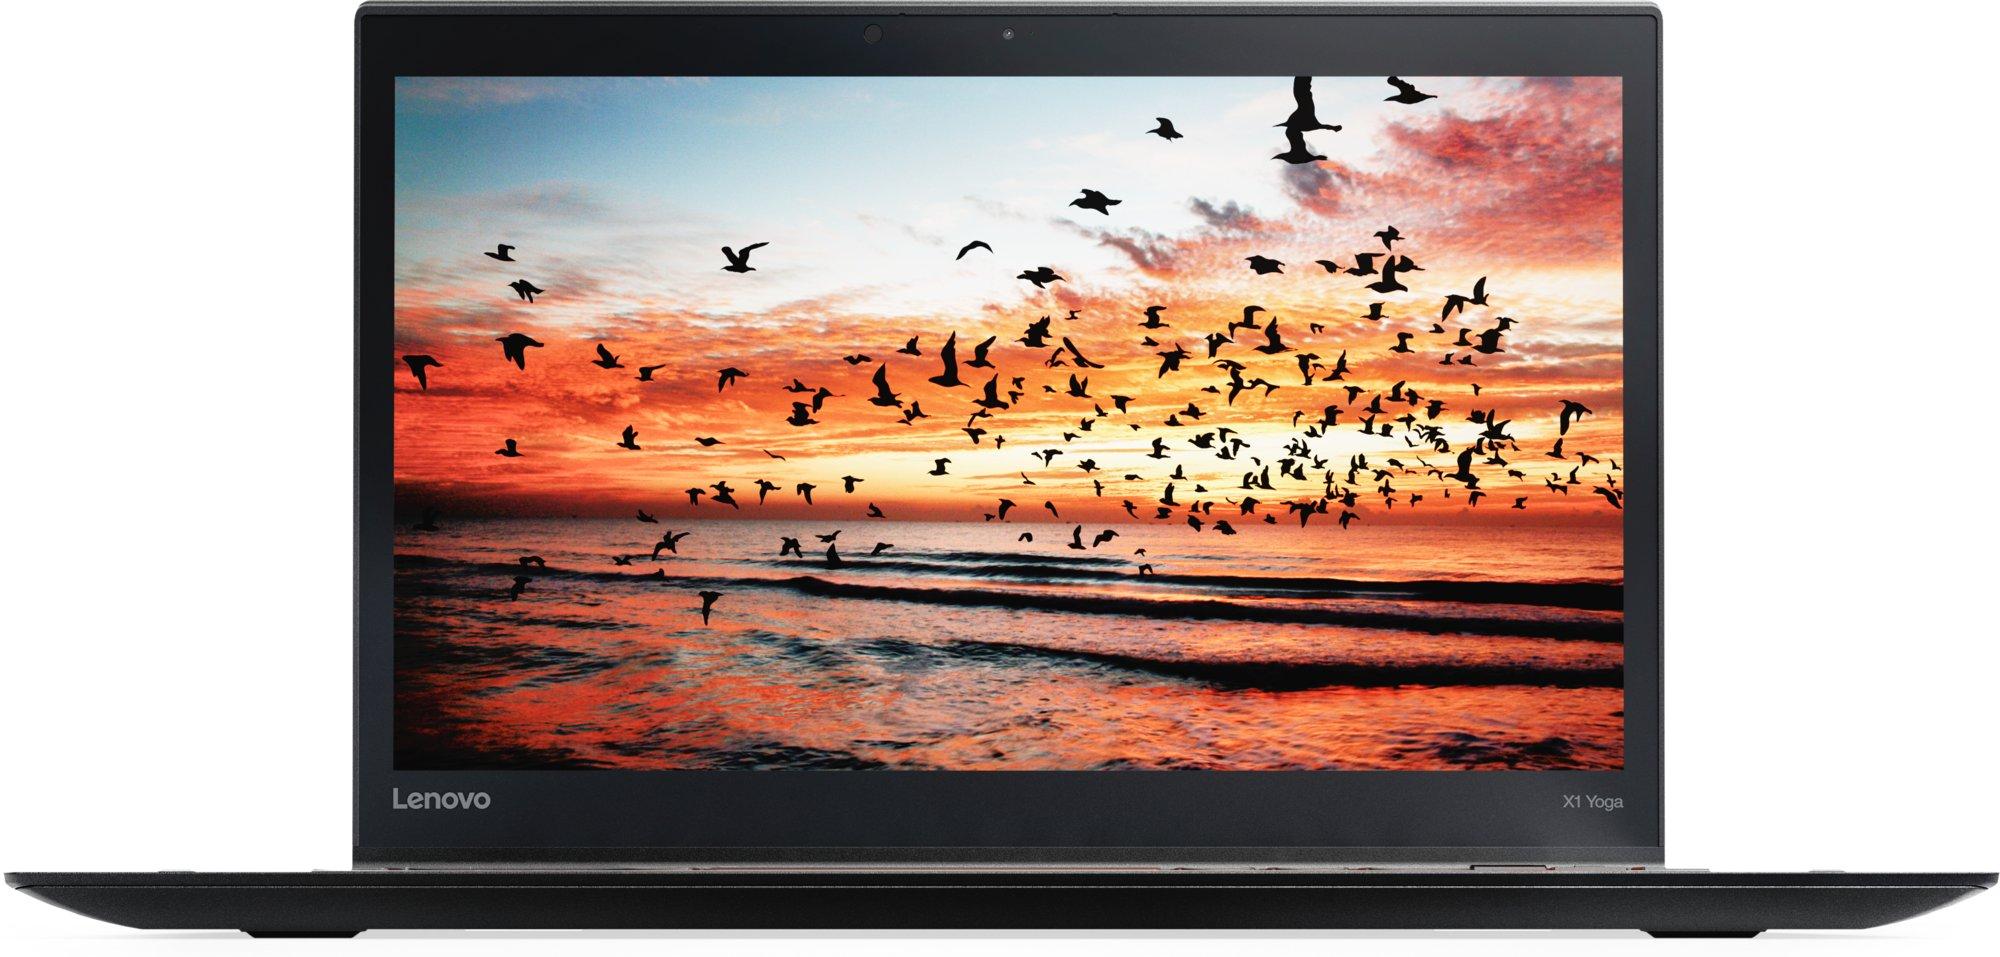 Lenovo ThinkPad X1 Yoga 2nd